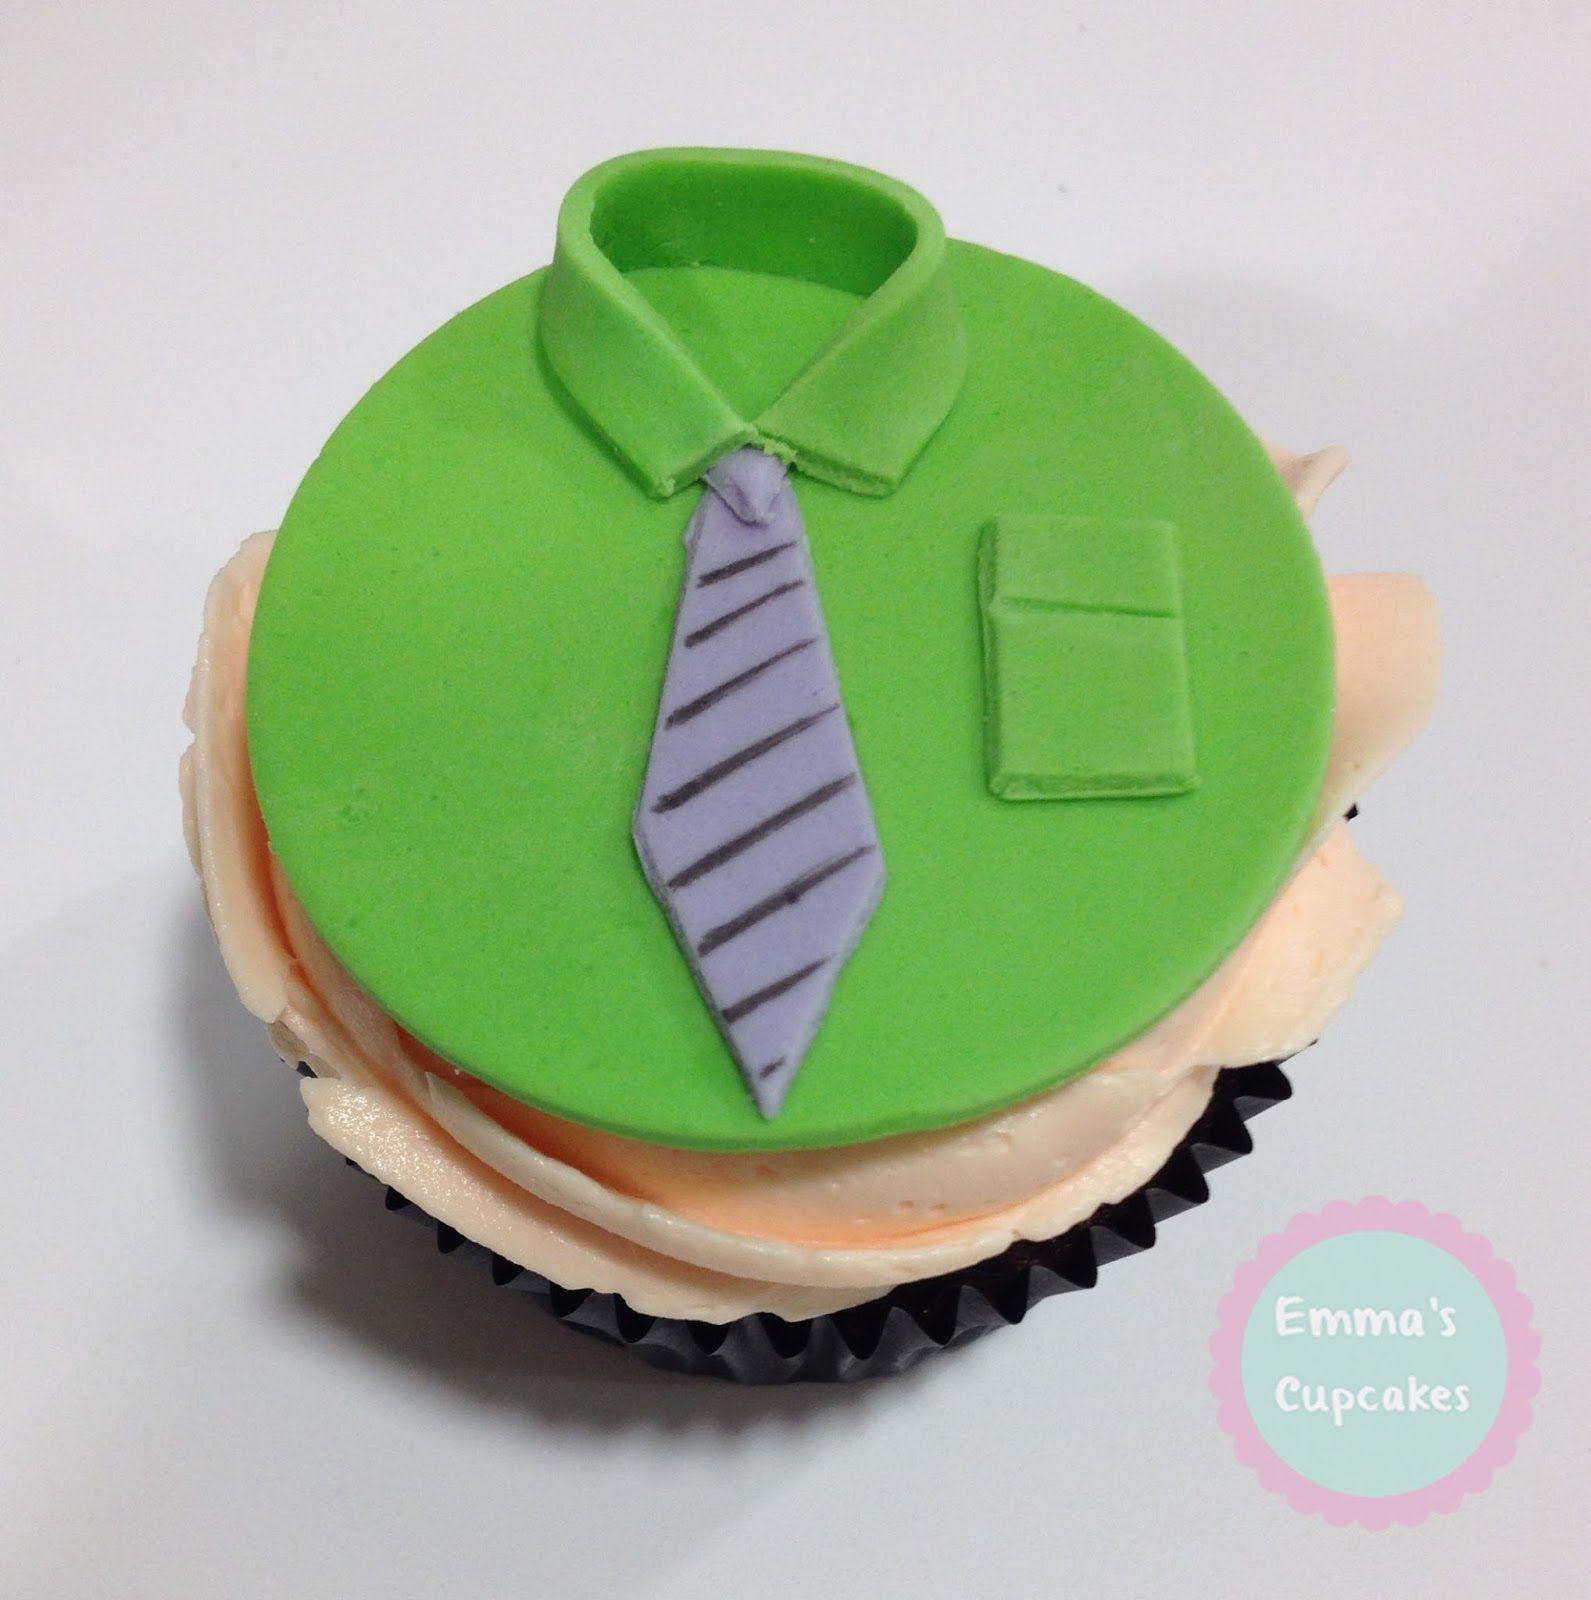 Emma's Cupcakes: Tutorial Camisa con Fondant (Día del Padre) - Father's Day Tutorial